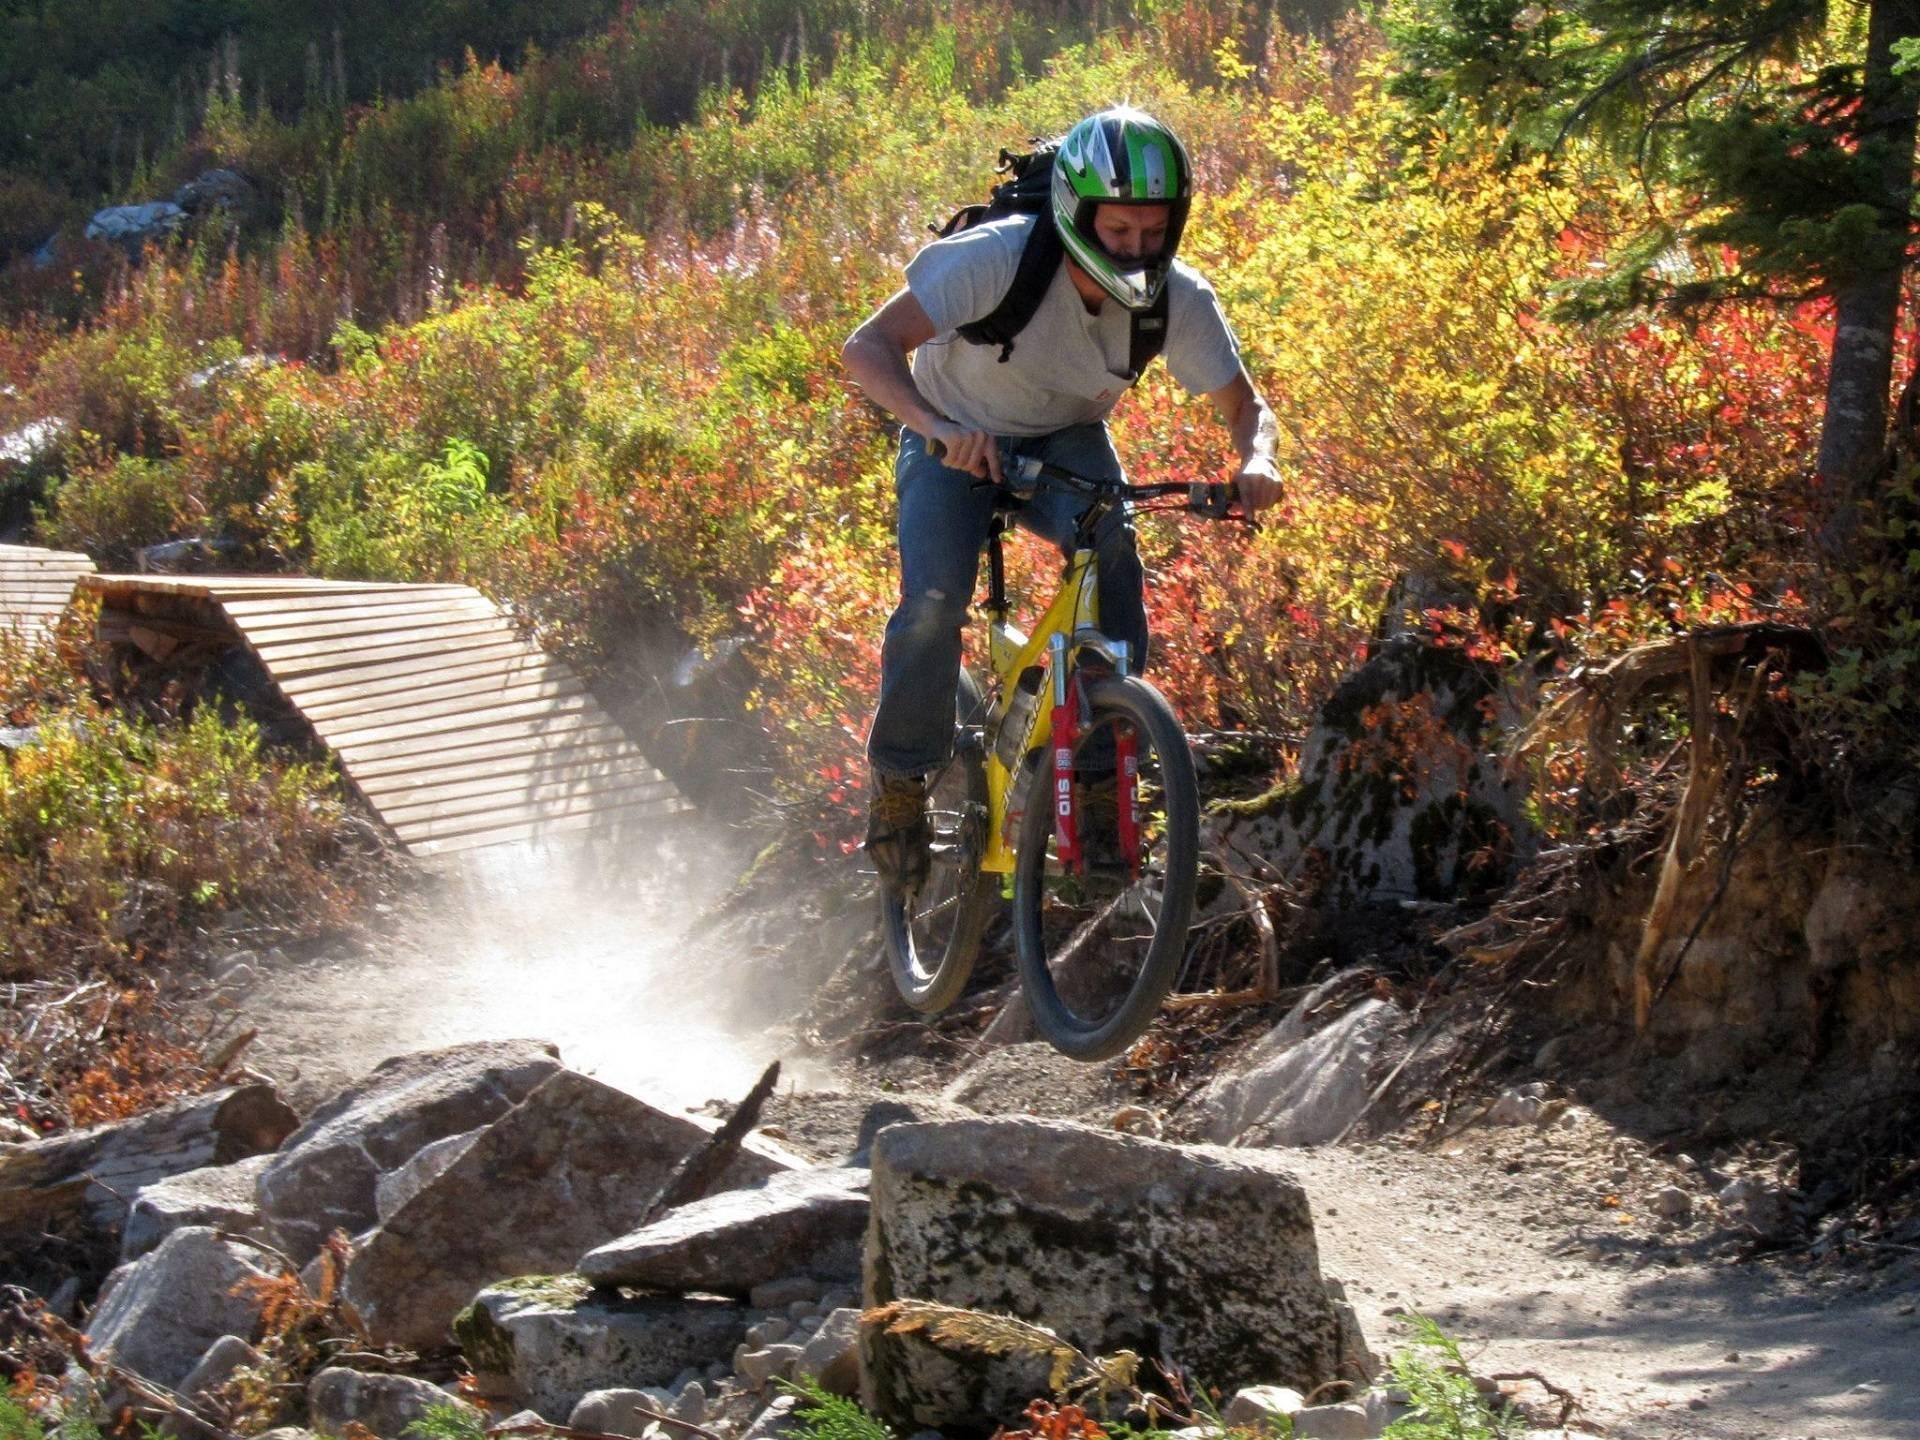 454c14ccc84eed1332be_fdcd0c34cb052545c116_mountain-biking-1744418.jpg